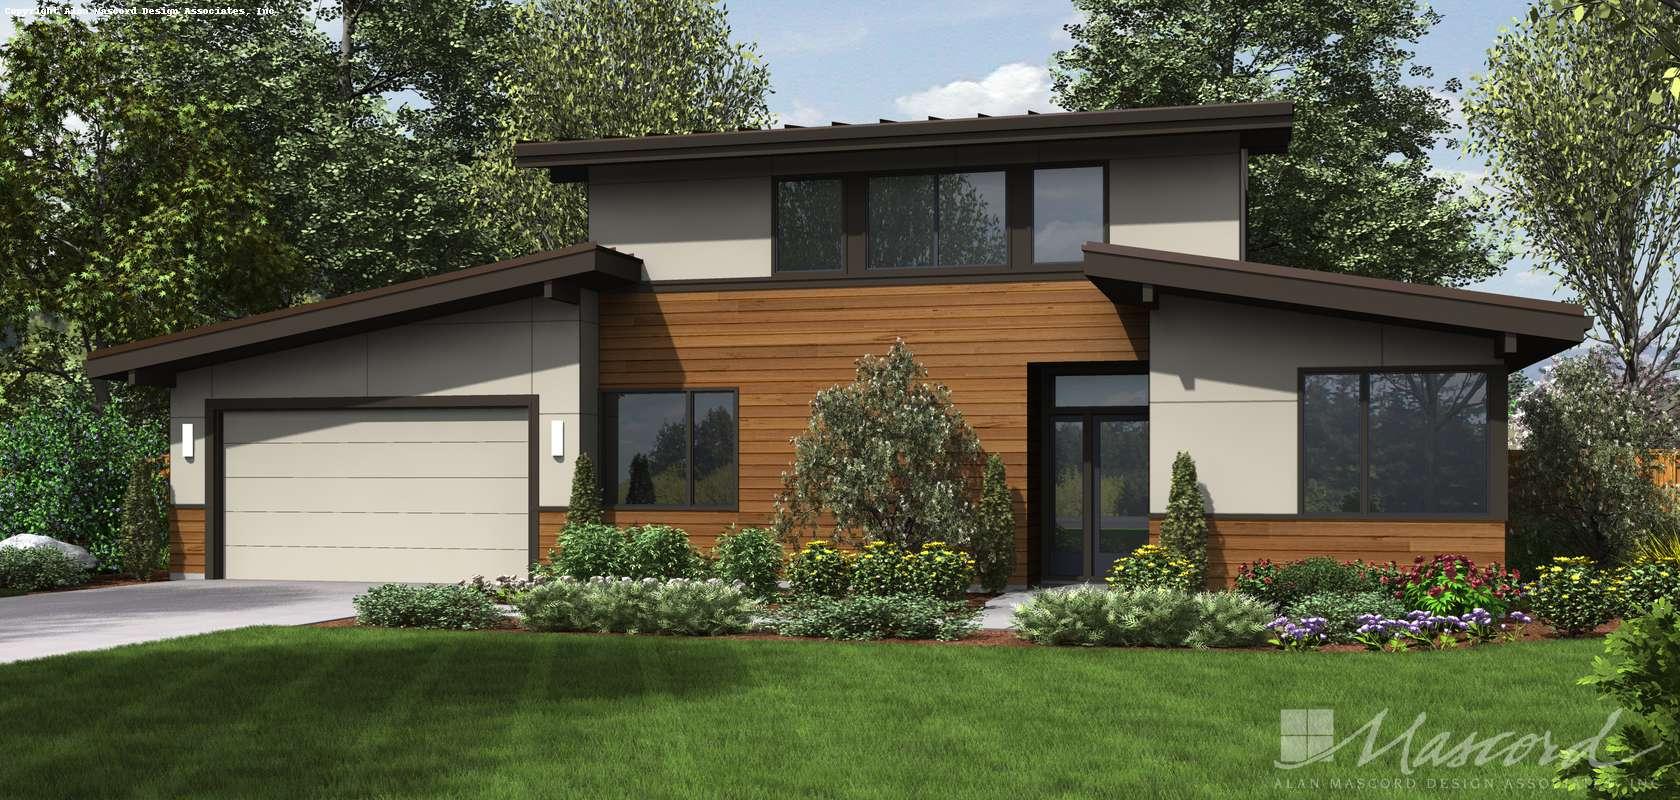 Mascord House Plan B21135: The